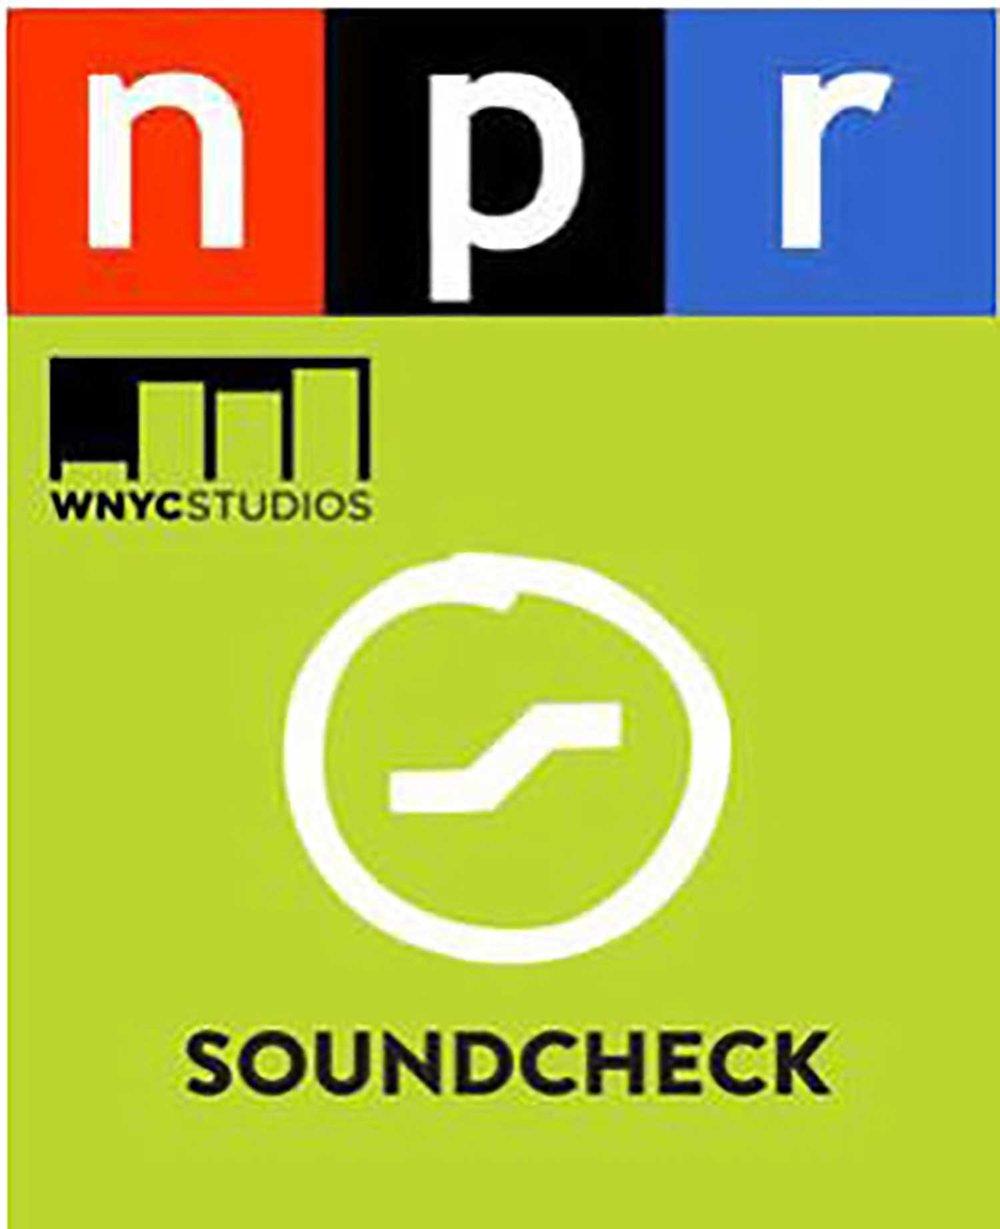 NPR,WNYC Soundcheck: Smackdown Wedding Band vs. DJ -